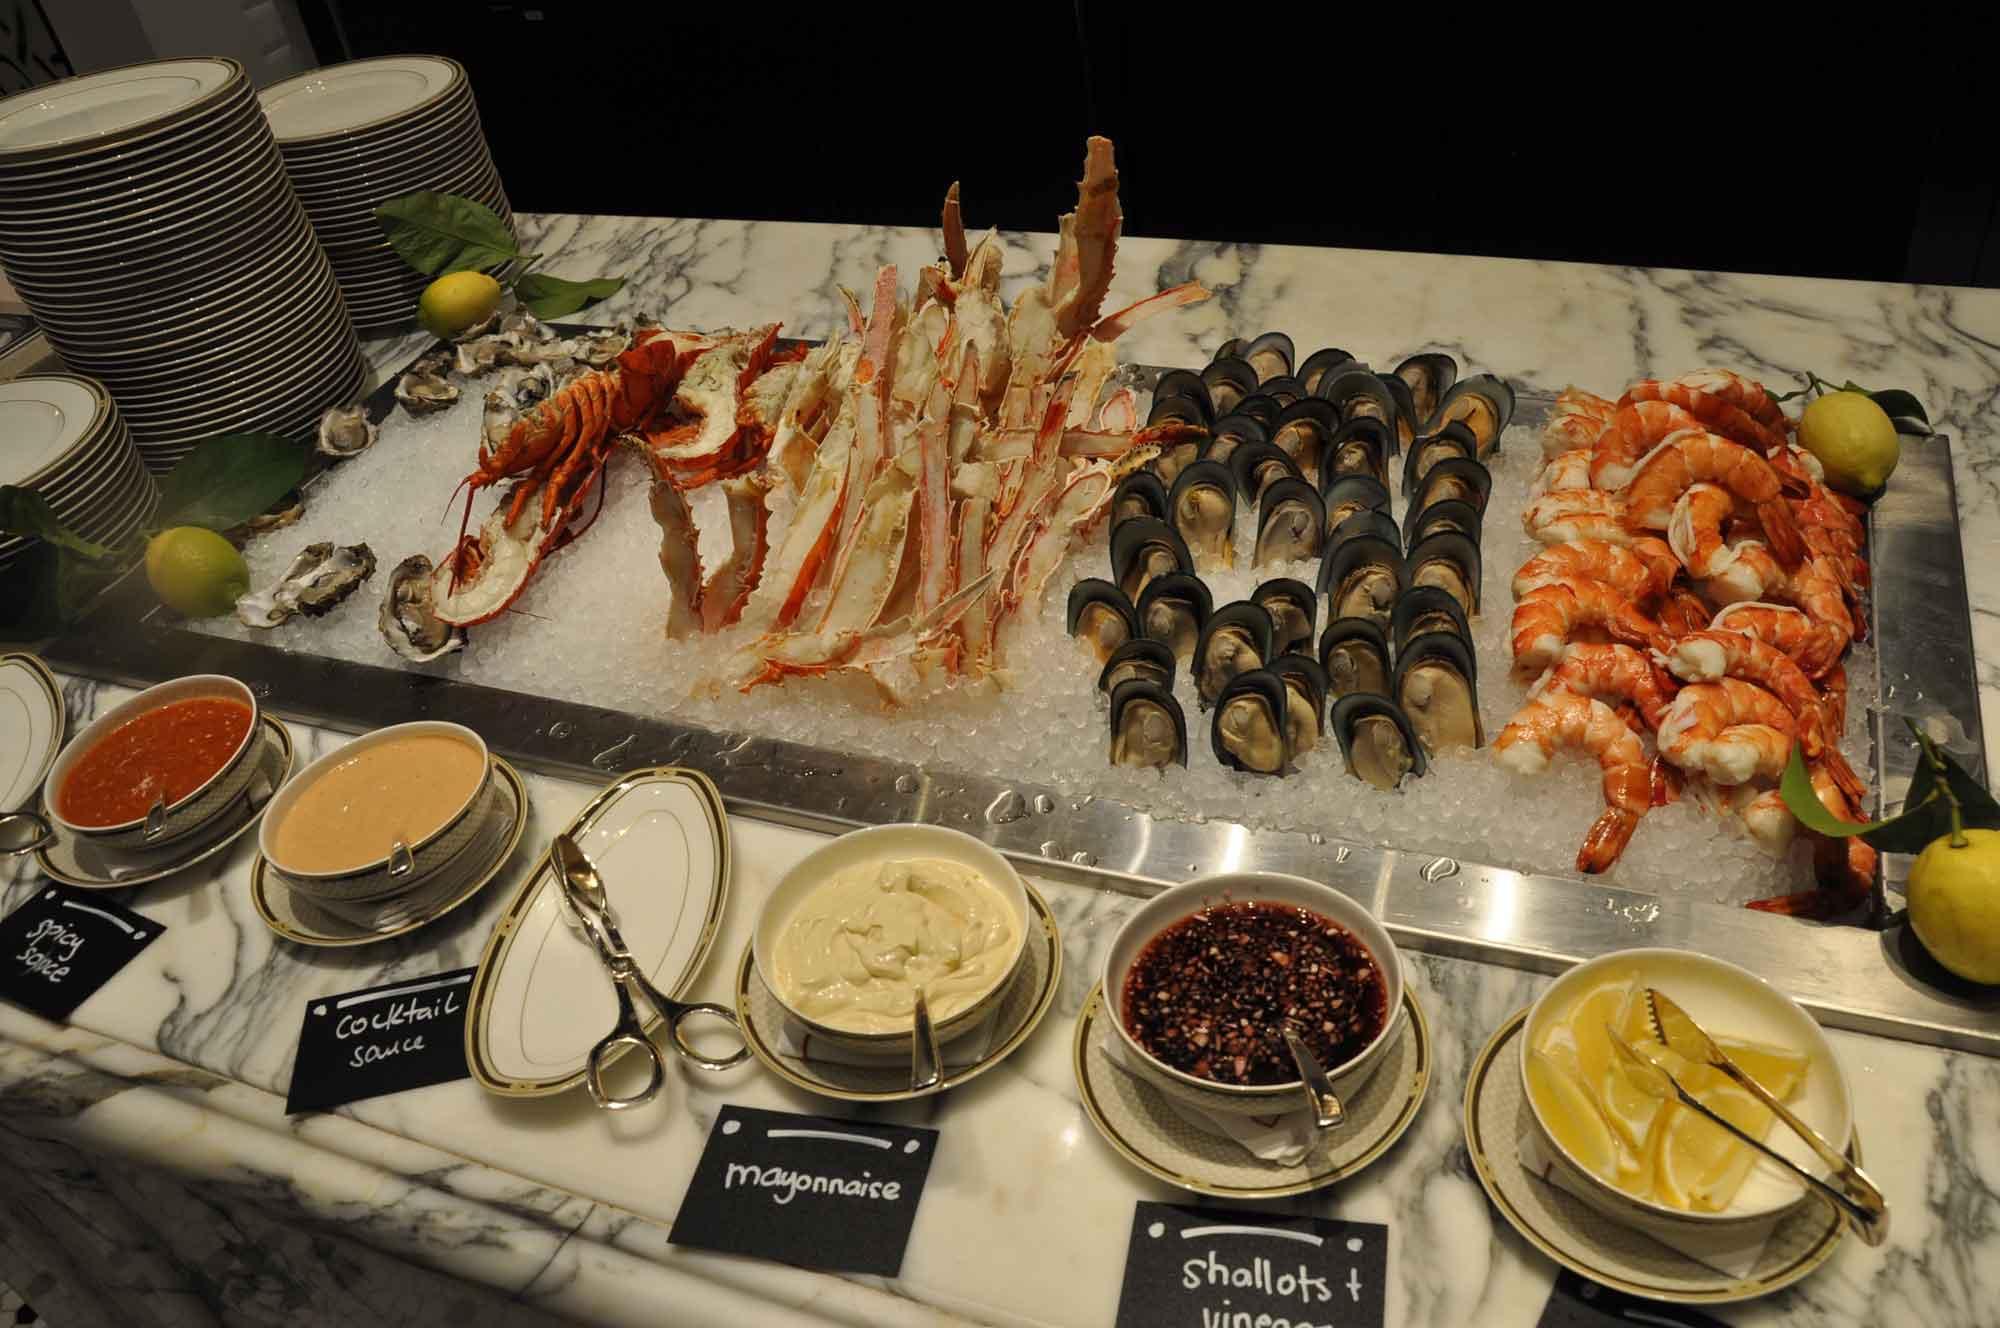 Ritz-Carlton Cafe Macau seafood section